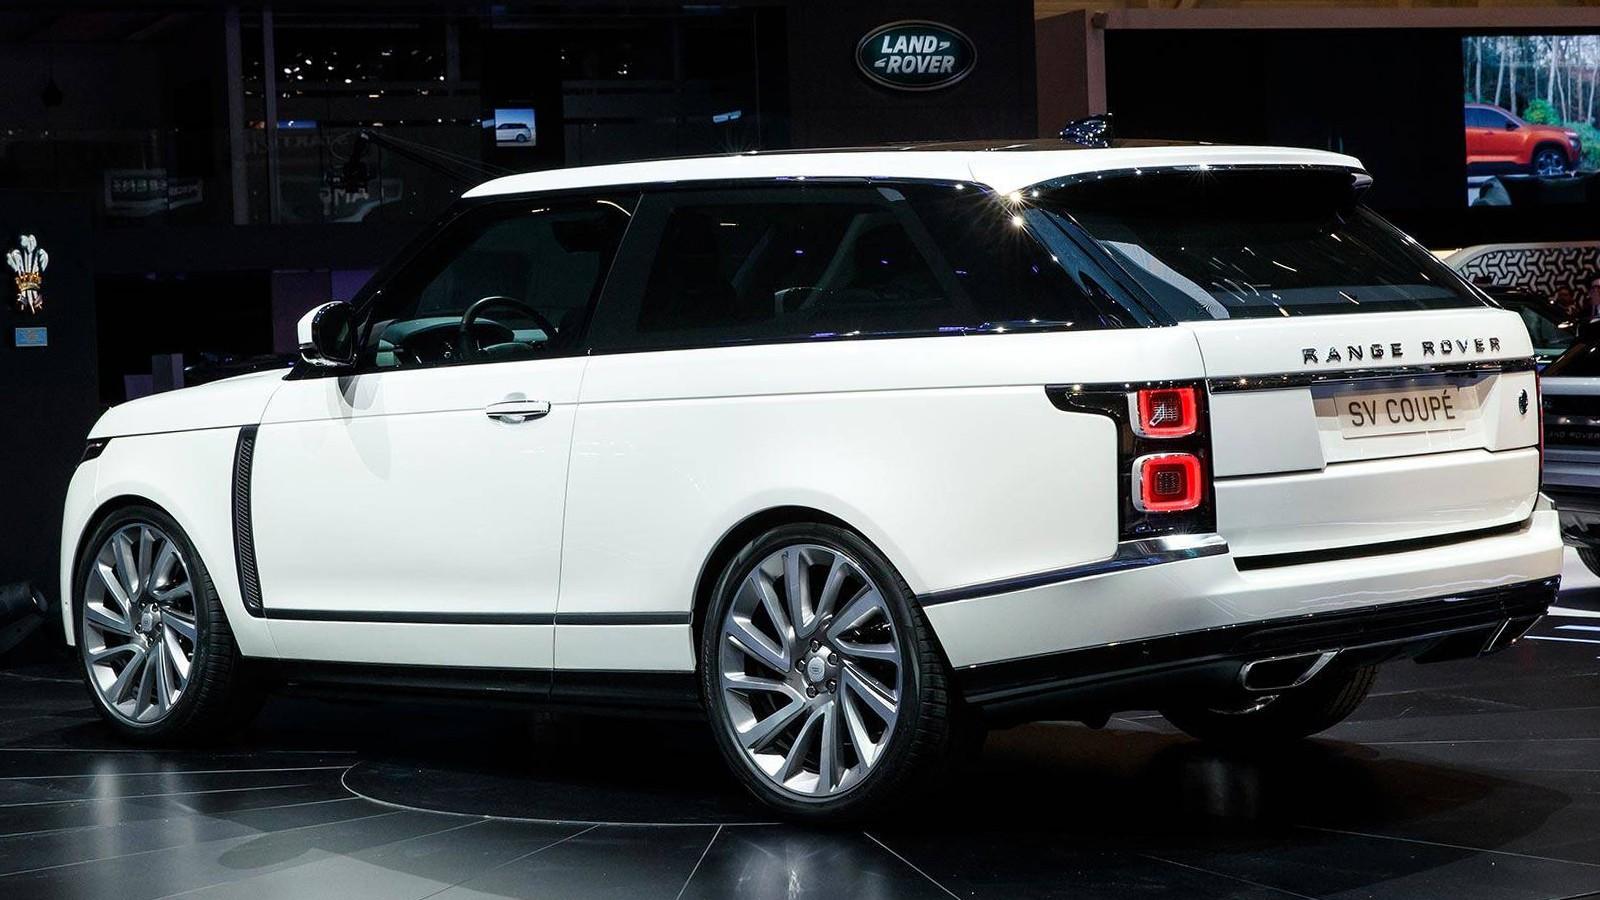 land-rover-range-rover-sv-coupe-geneva-2018